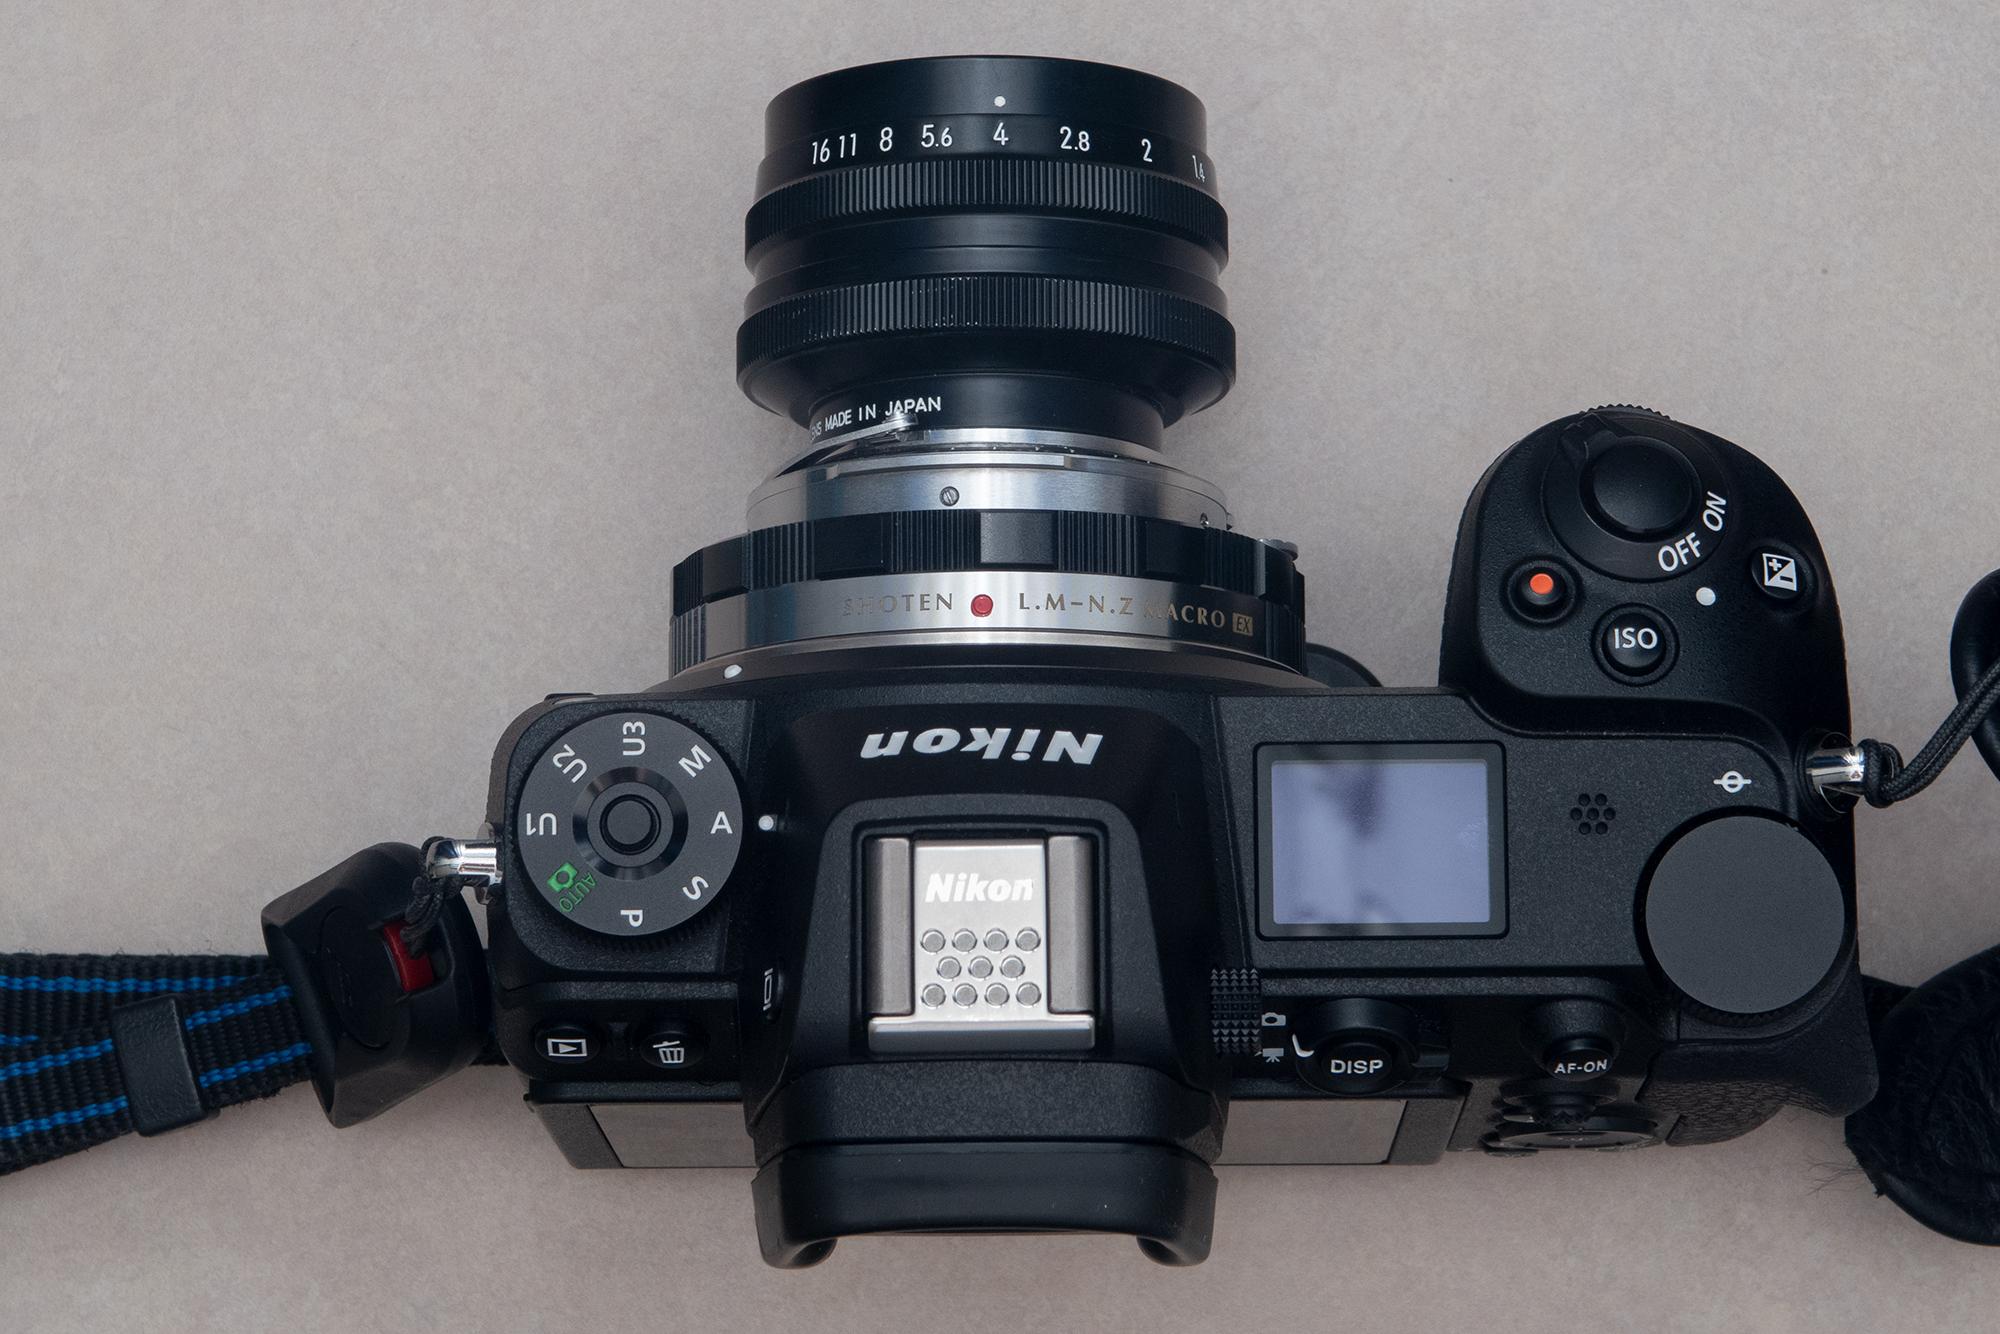 S50mm F1.4付